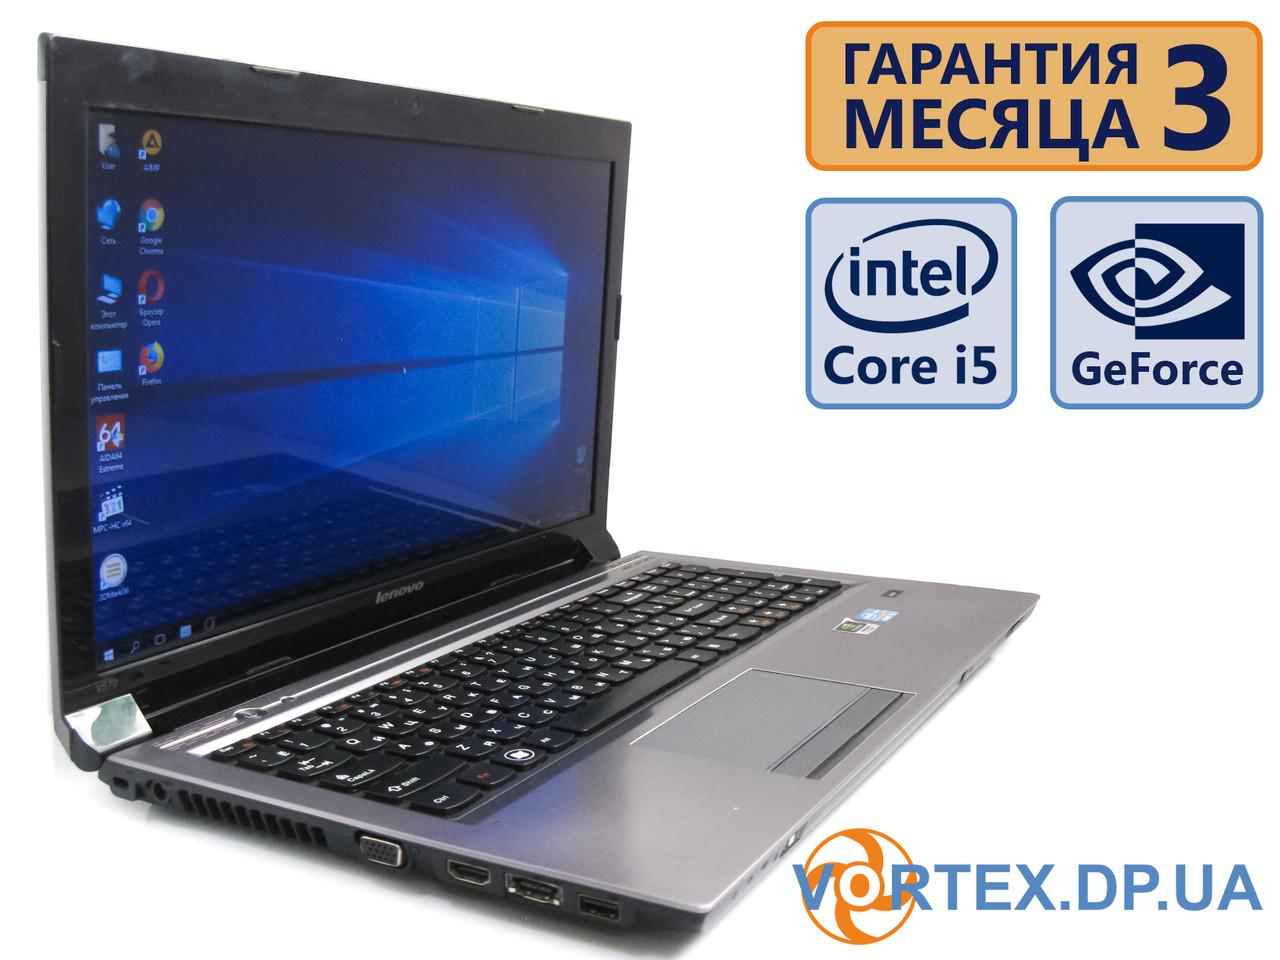 Ноутбук Lenovo V570 15.6 (1366x768) / Intel Core i5-2430M (2x2.4GHz) /